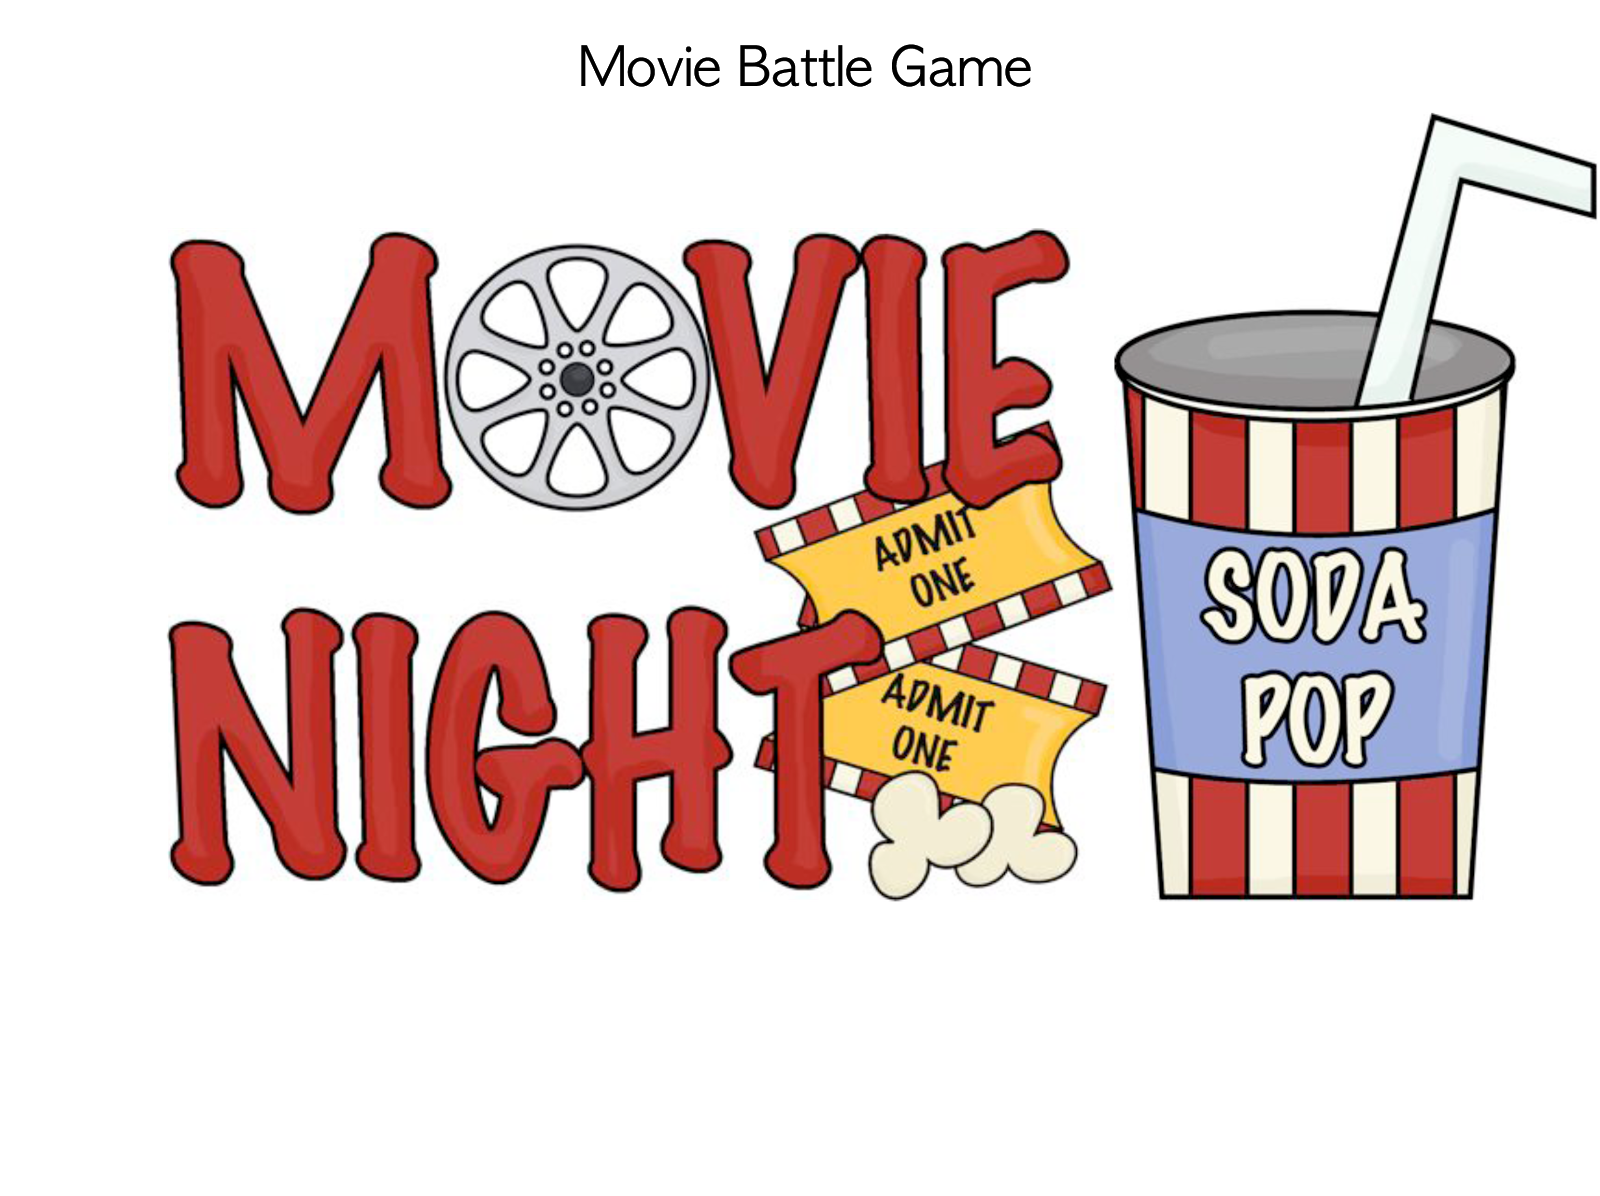 Movie clipart free clip art image image-Movie clipart free clip art image image-9